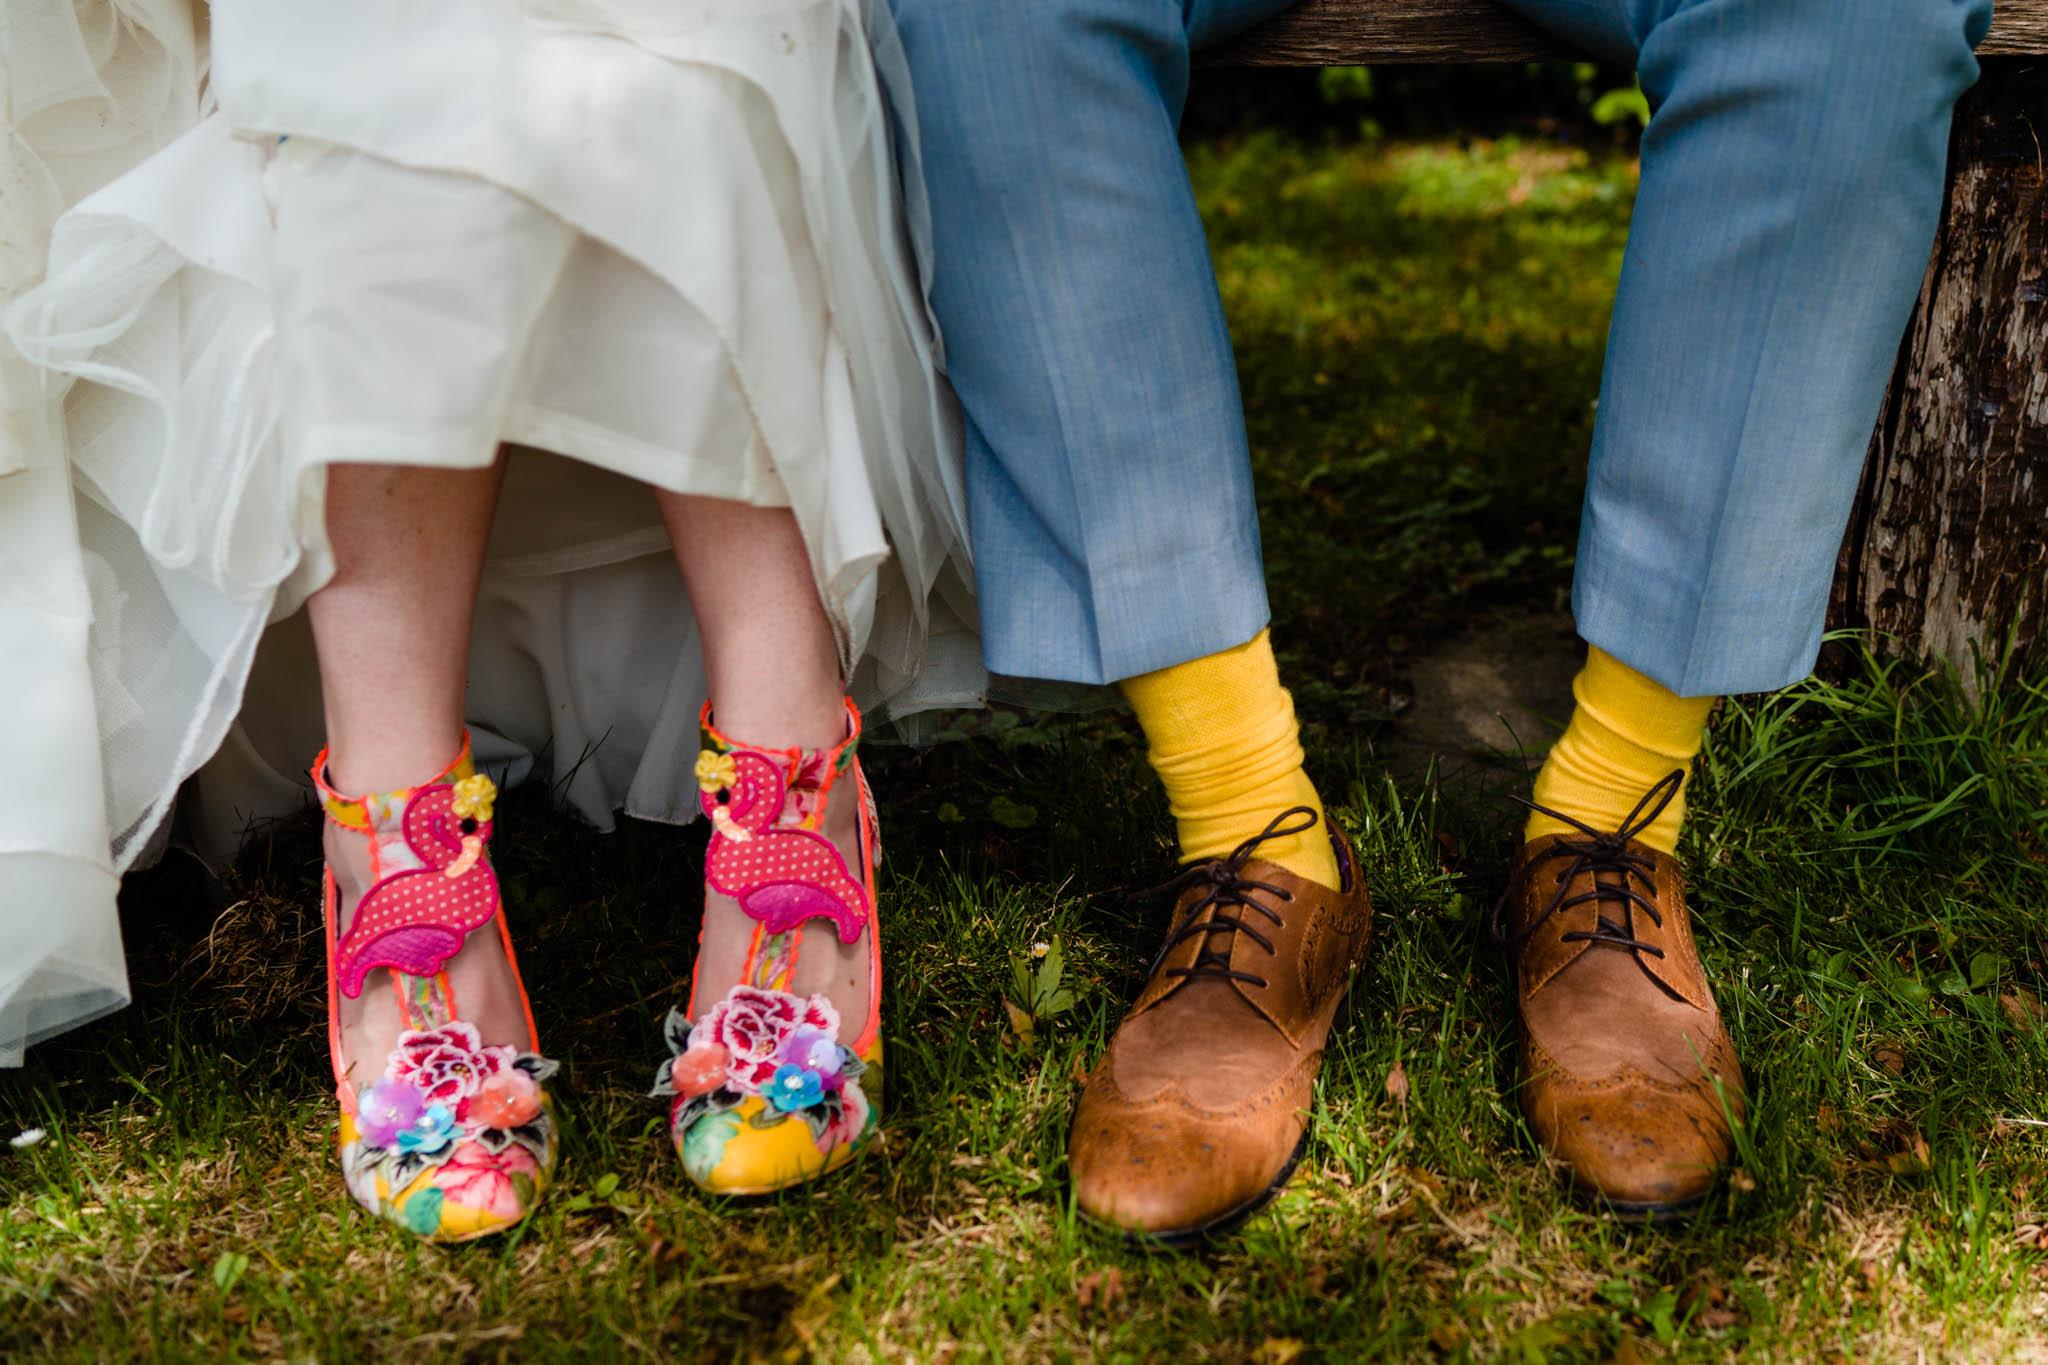 post lockdown weddings - covid wedding advice - quirky wedding shoes